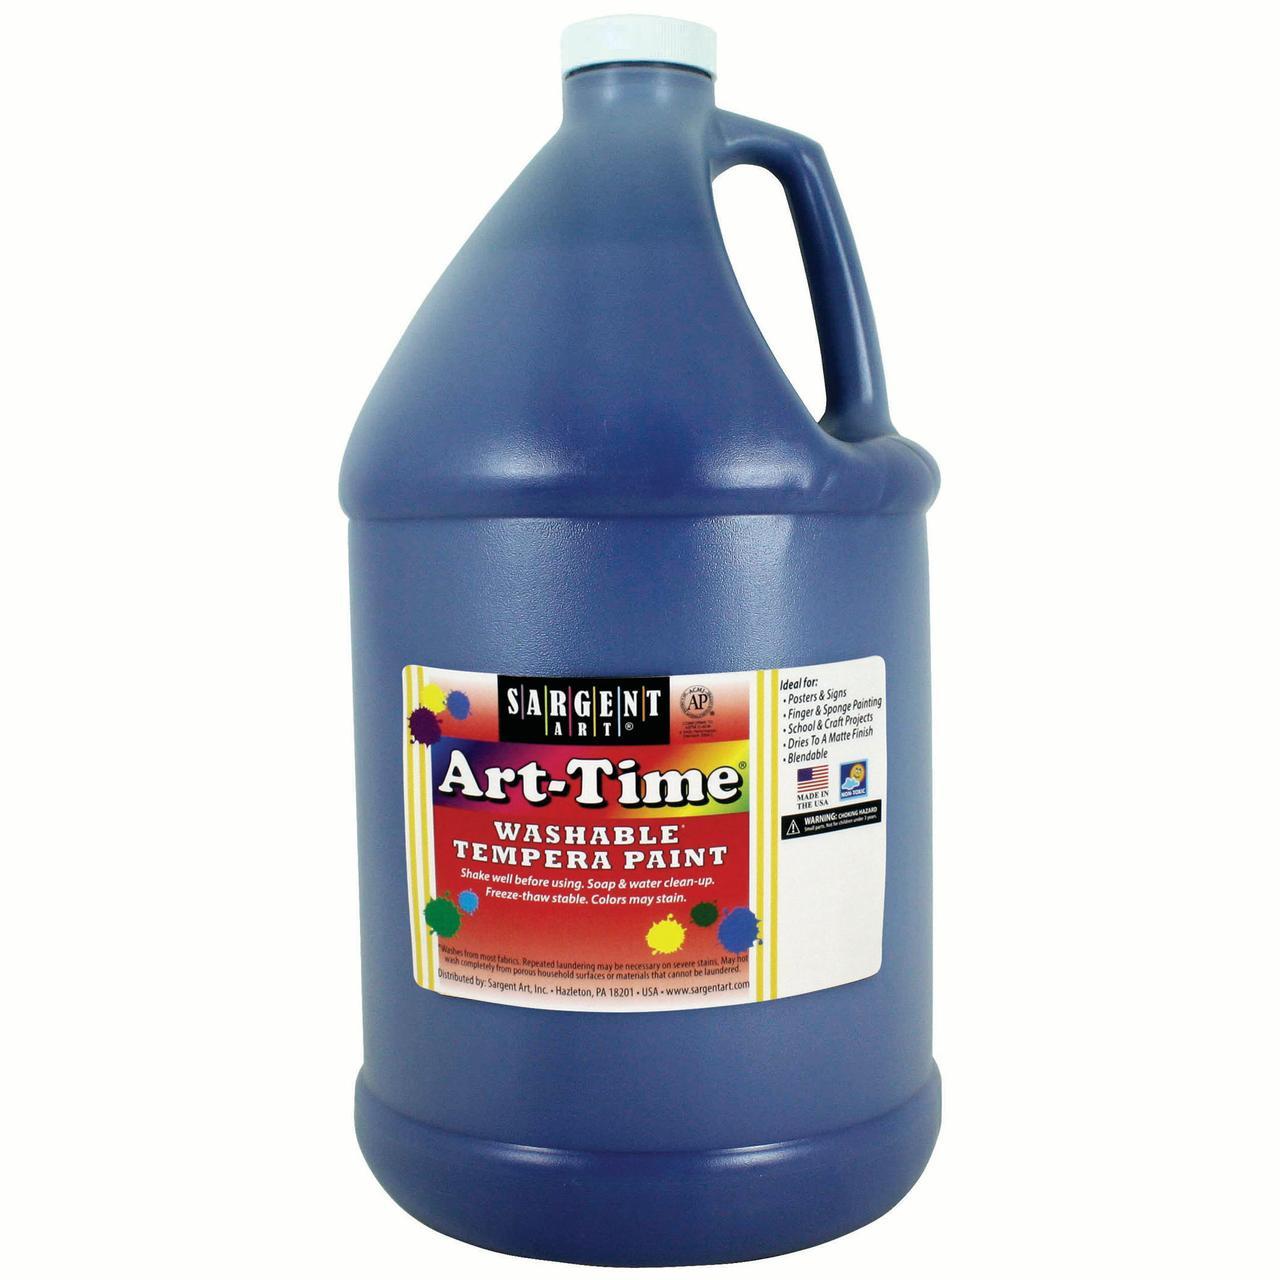 Art-Time® Washable Tempera Paint, Blue - Gallon